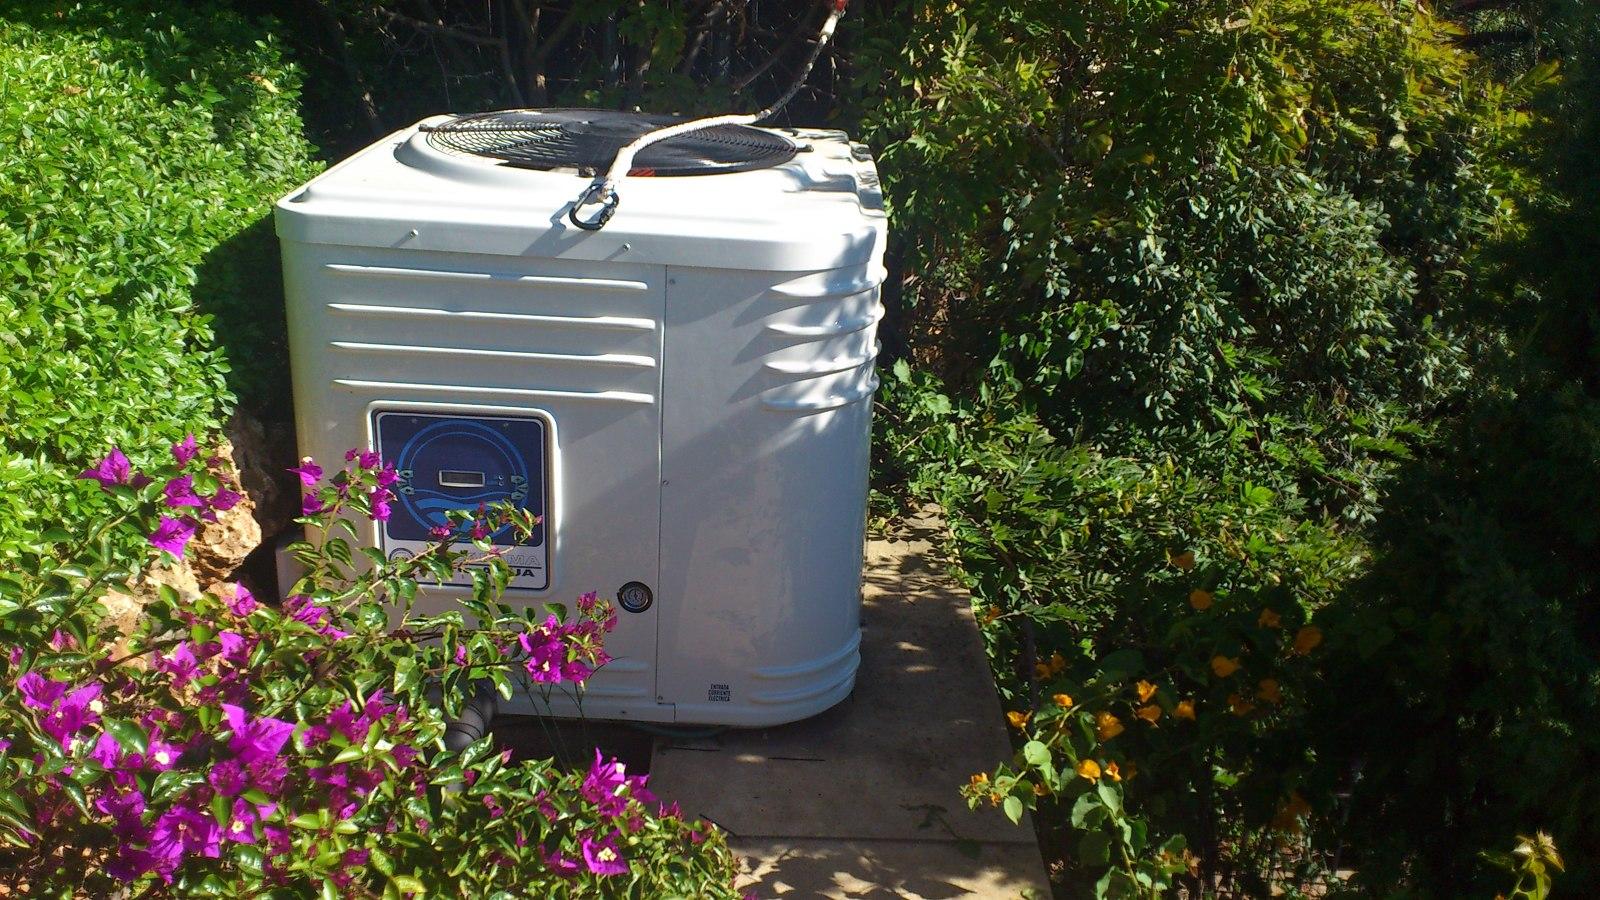 Bomba de calor para calentamiento de piscinas, Baeza